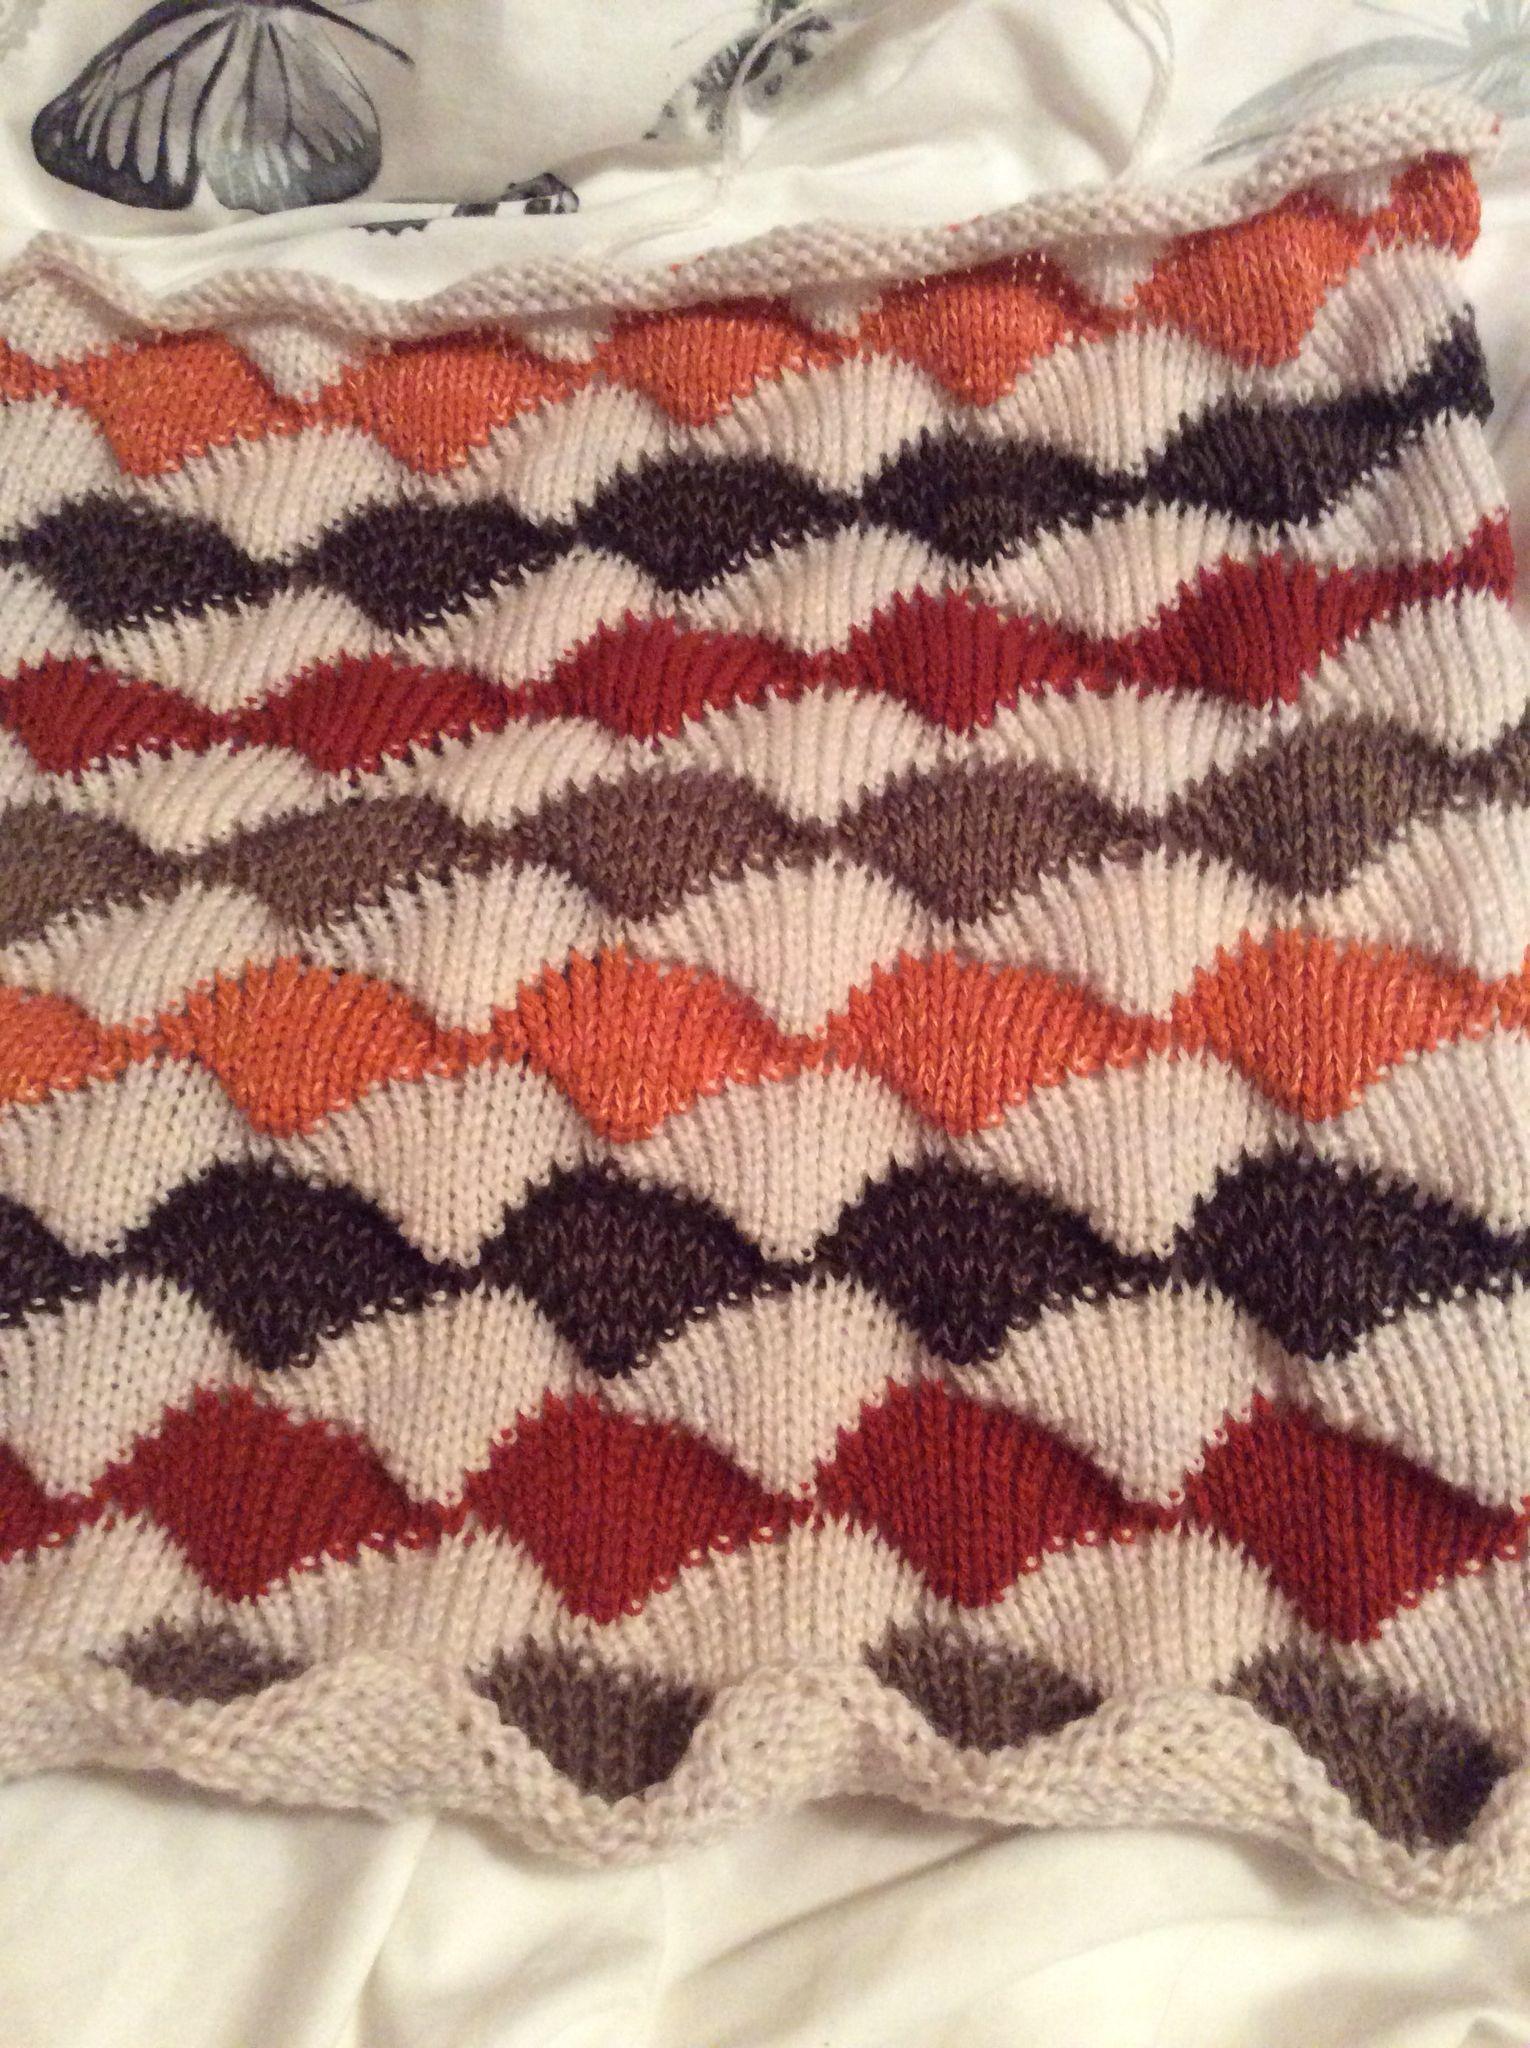 Diana sullivans seashell pattern knitted on my chunky brother 260 diana sullivans seashell pattern knitted on my chunky brother 260 bankloansurffo Images